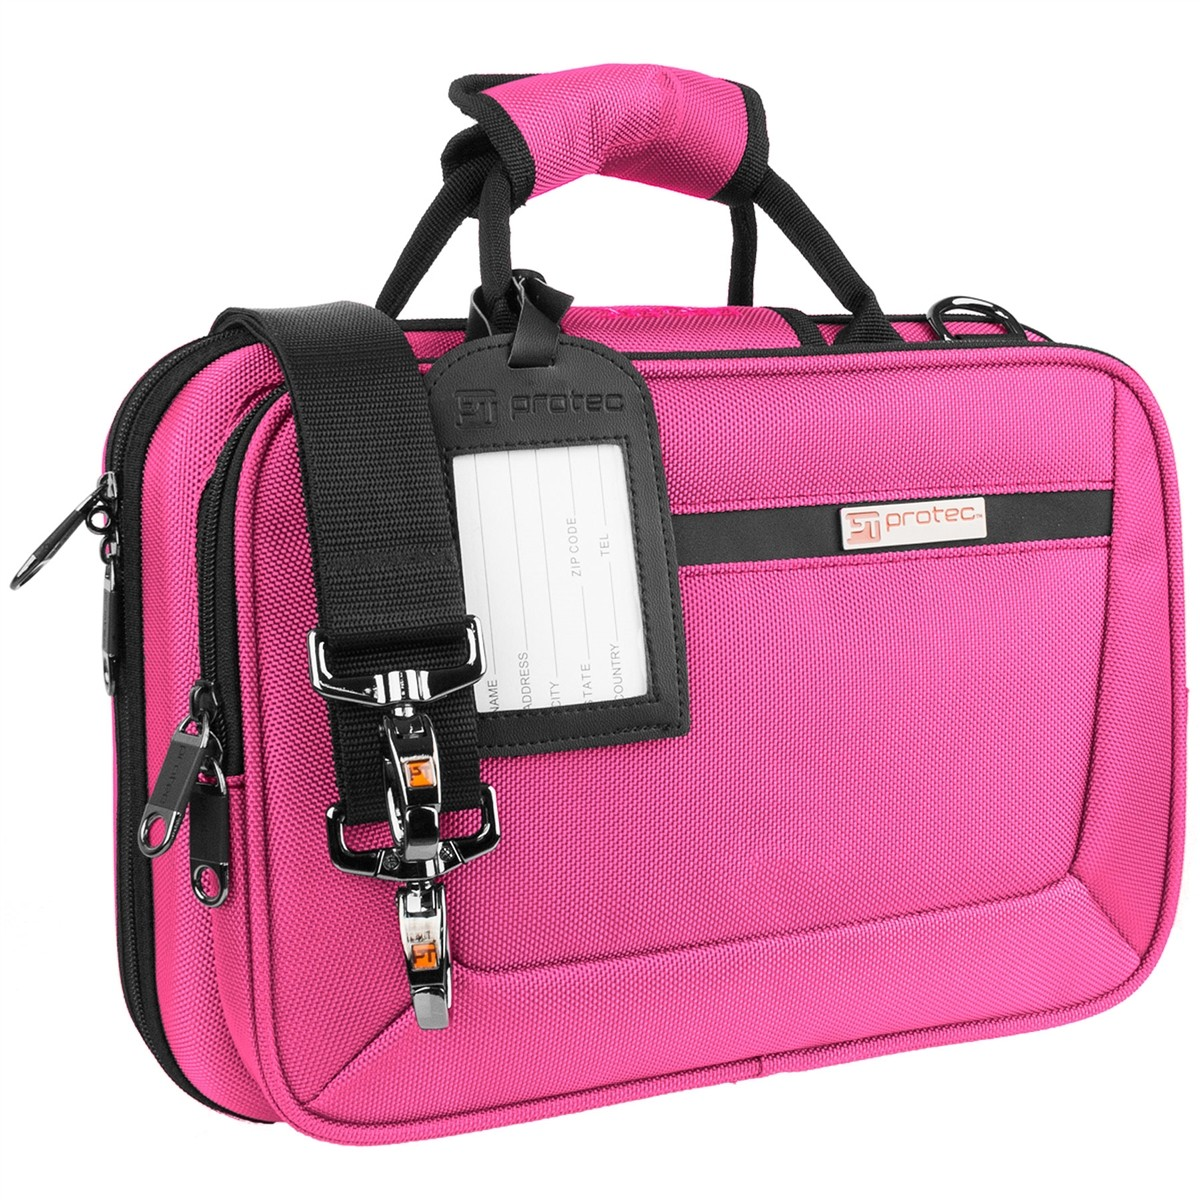 Protec Bb Clarinet PRO PAC Case – Slimline (Hot Pink PB307HP)